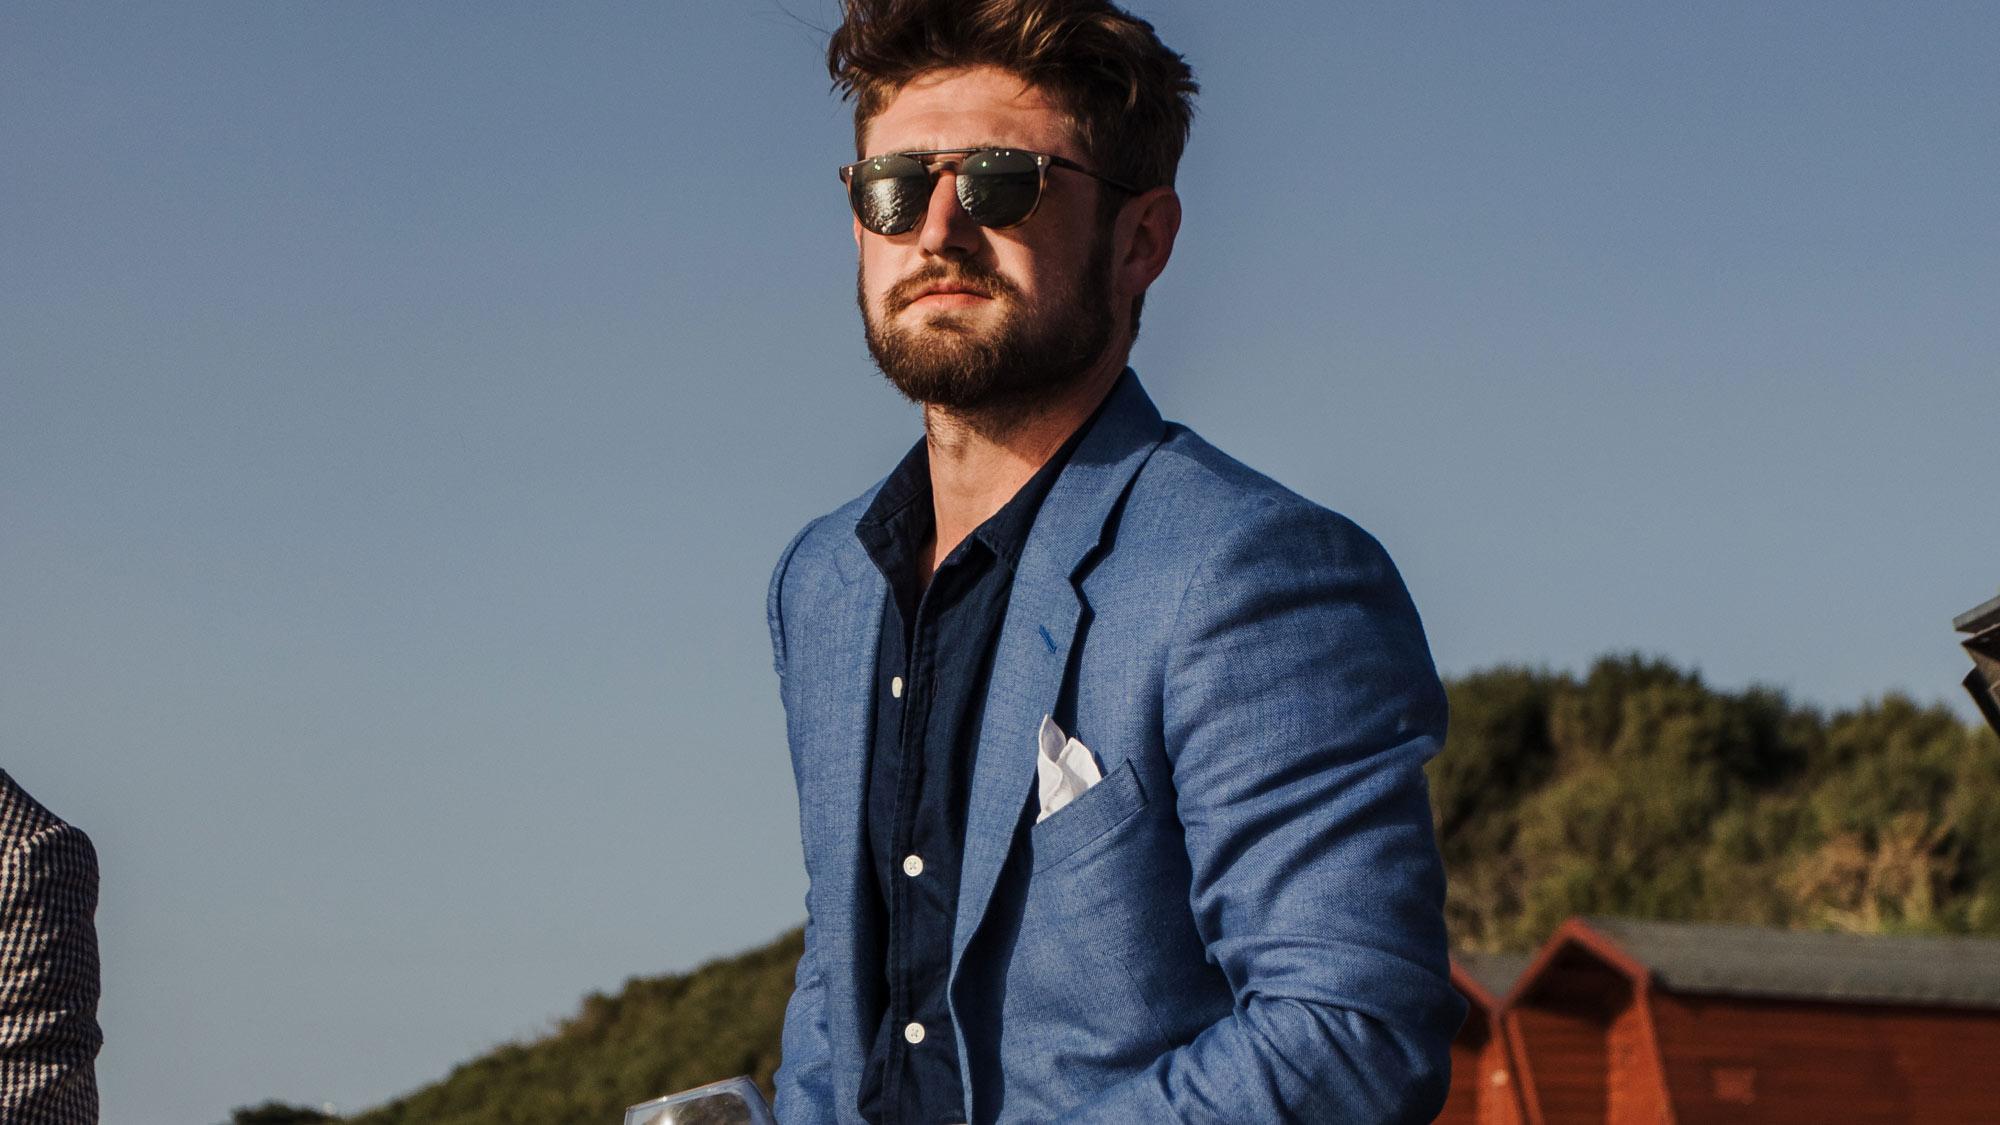 Bespoke Summer Suits